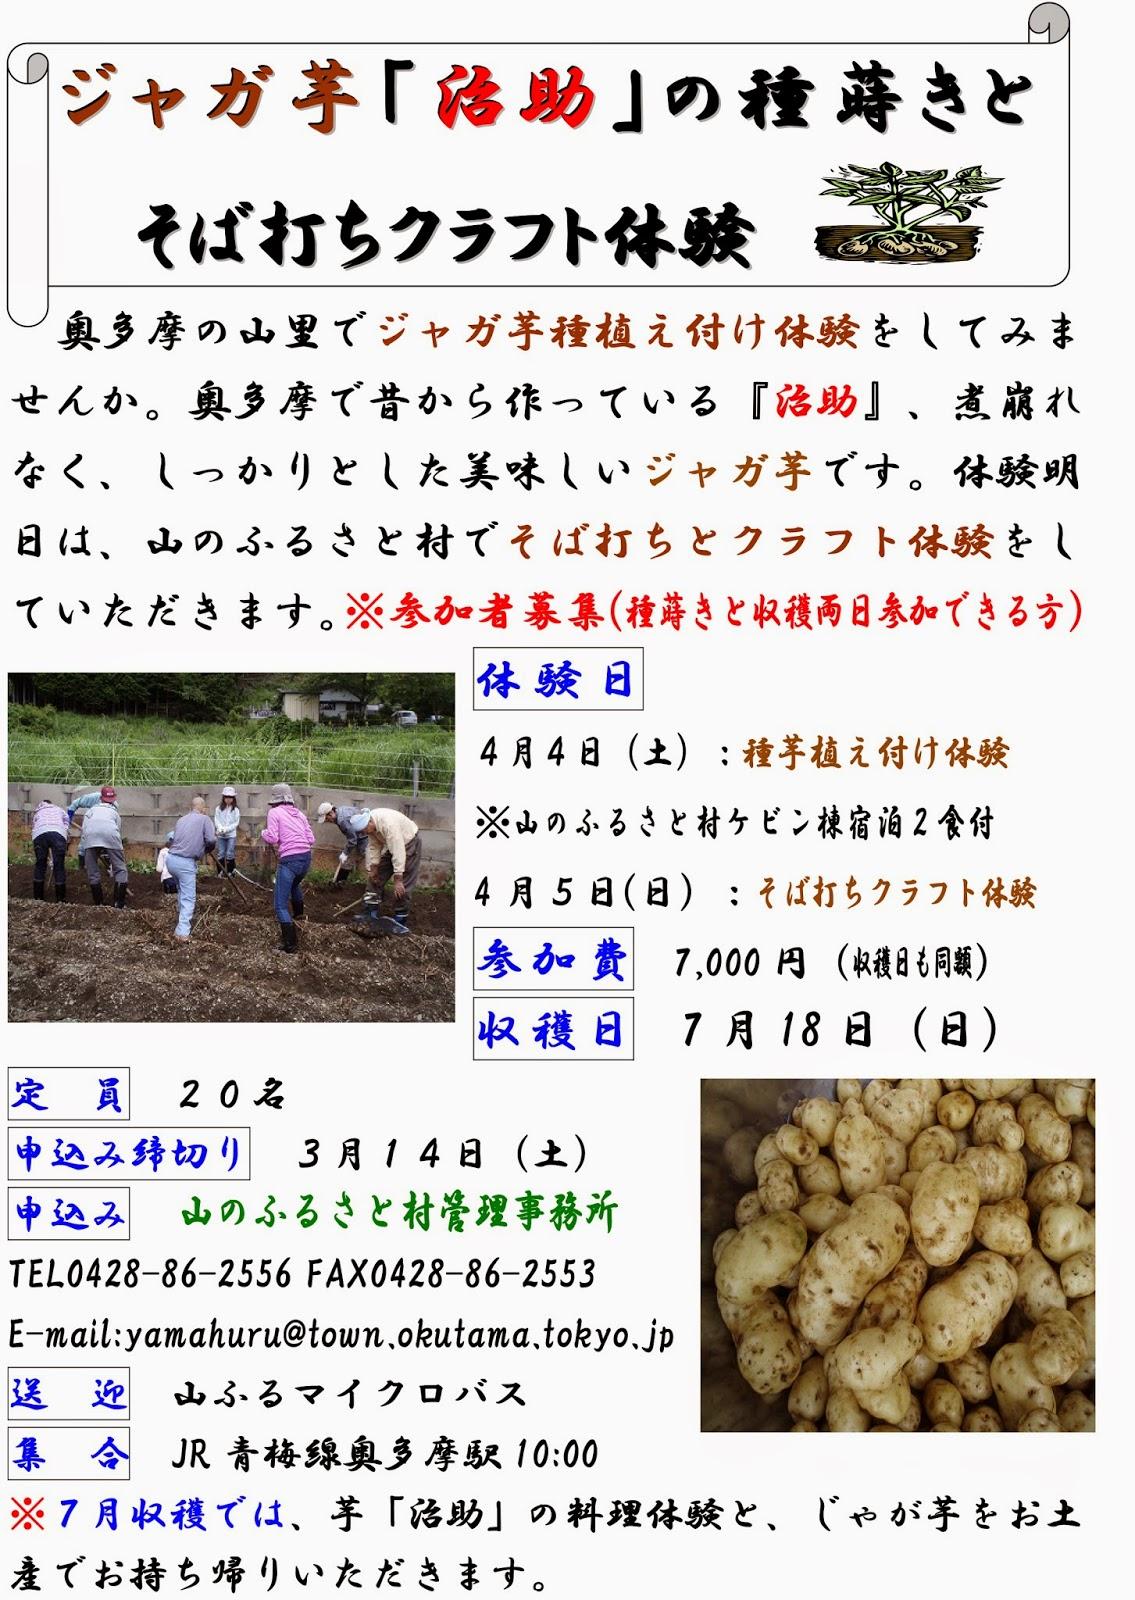 http://www.yamafuru.com/chirashi/20150404jagaimo.pdf